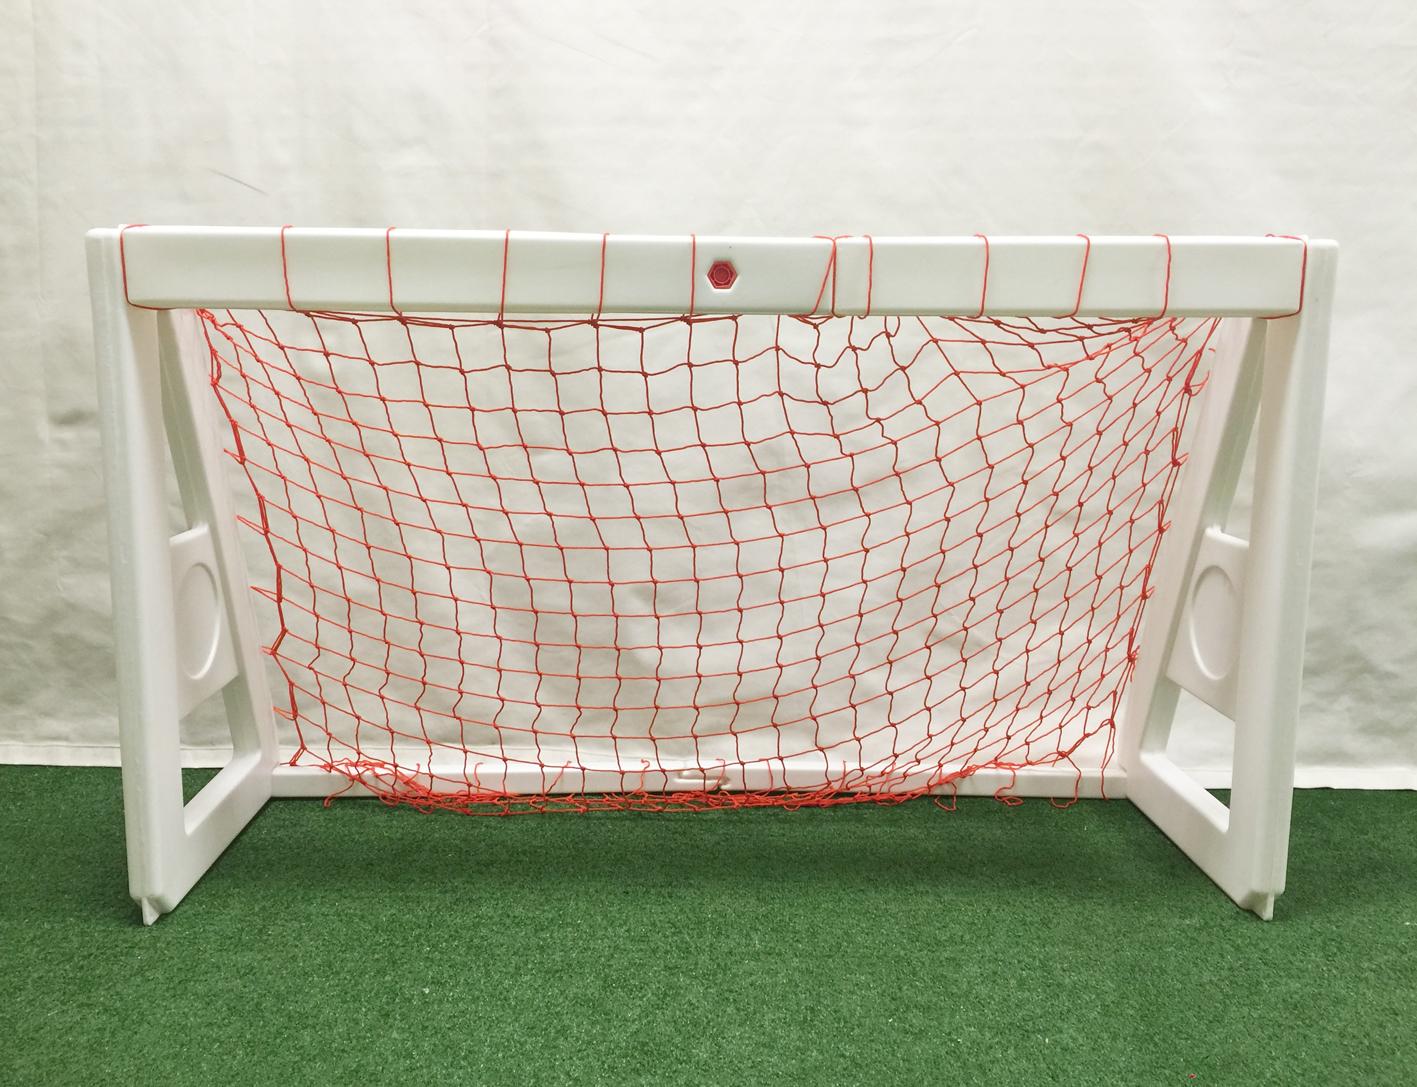 Universal Portable Sports Goal (Easy to Setup)-0